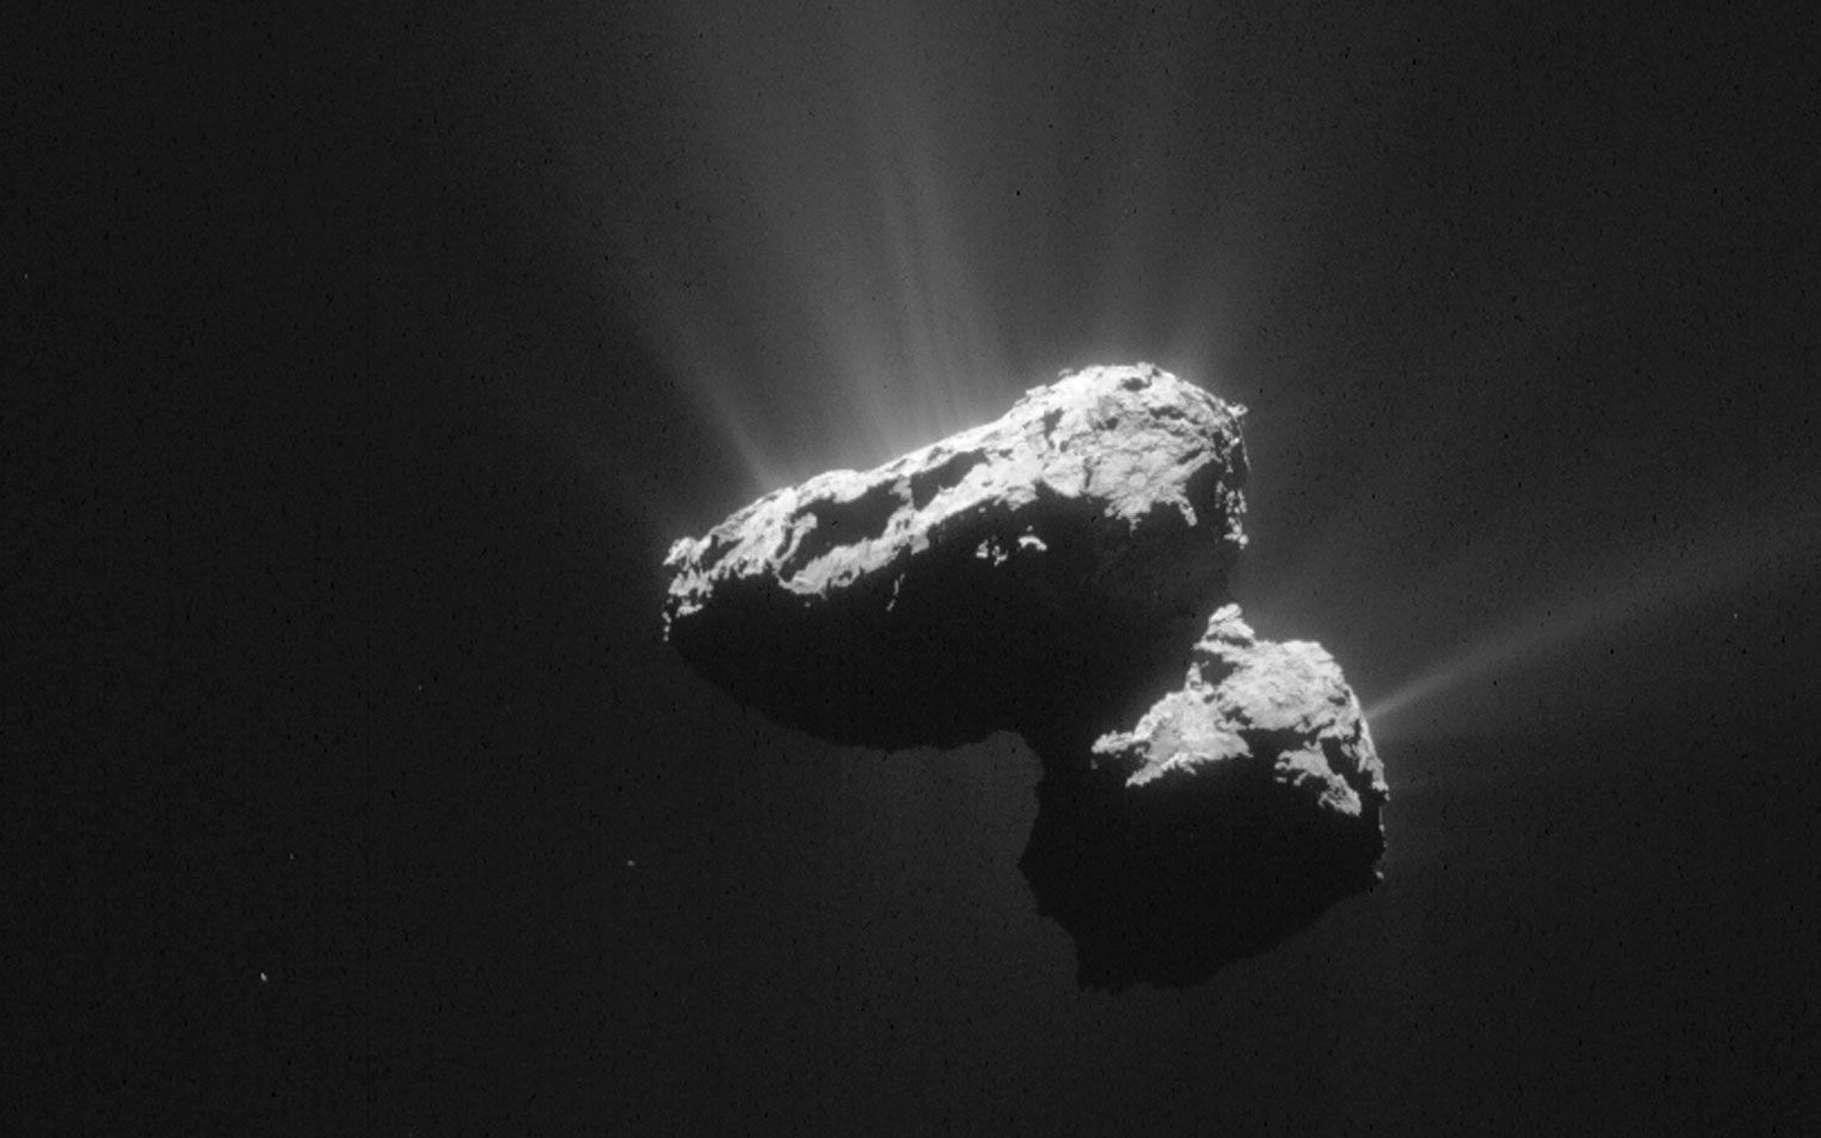 Le noyau bilobé de la comète 67P/Churyumov-Gerasimenko, alias Tchouri, photographié par Rosetta. Sa forme lui a valu d'être surnommée le « canard de bain ». © Esa, Rosetta, NavCam, CC BY-SA IGO 3.0